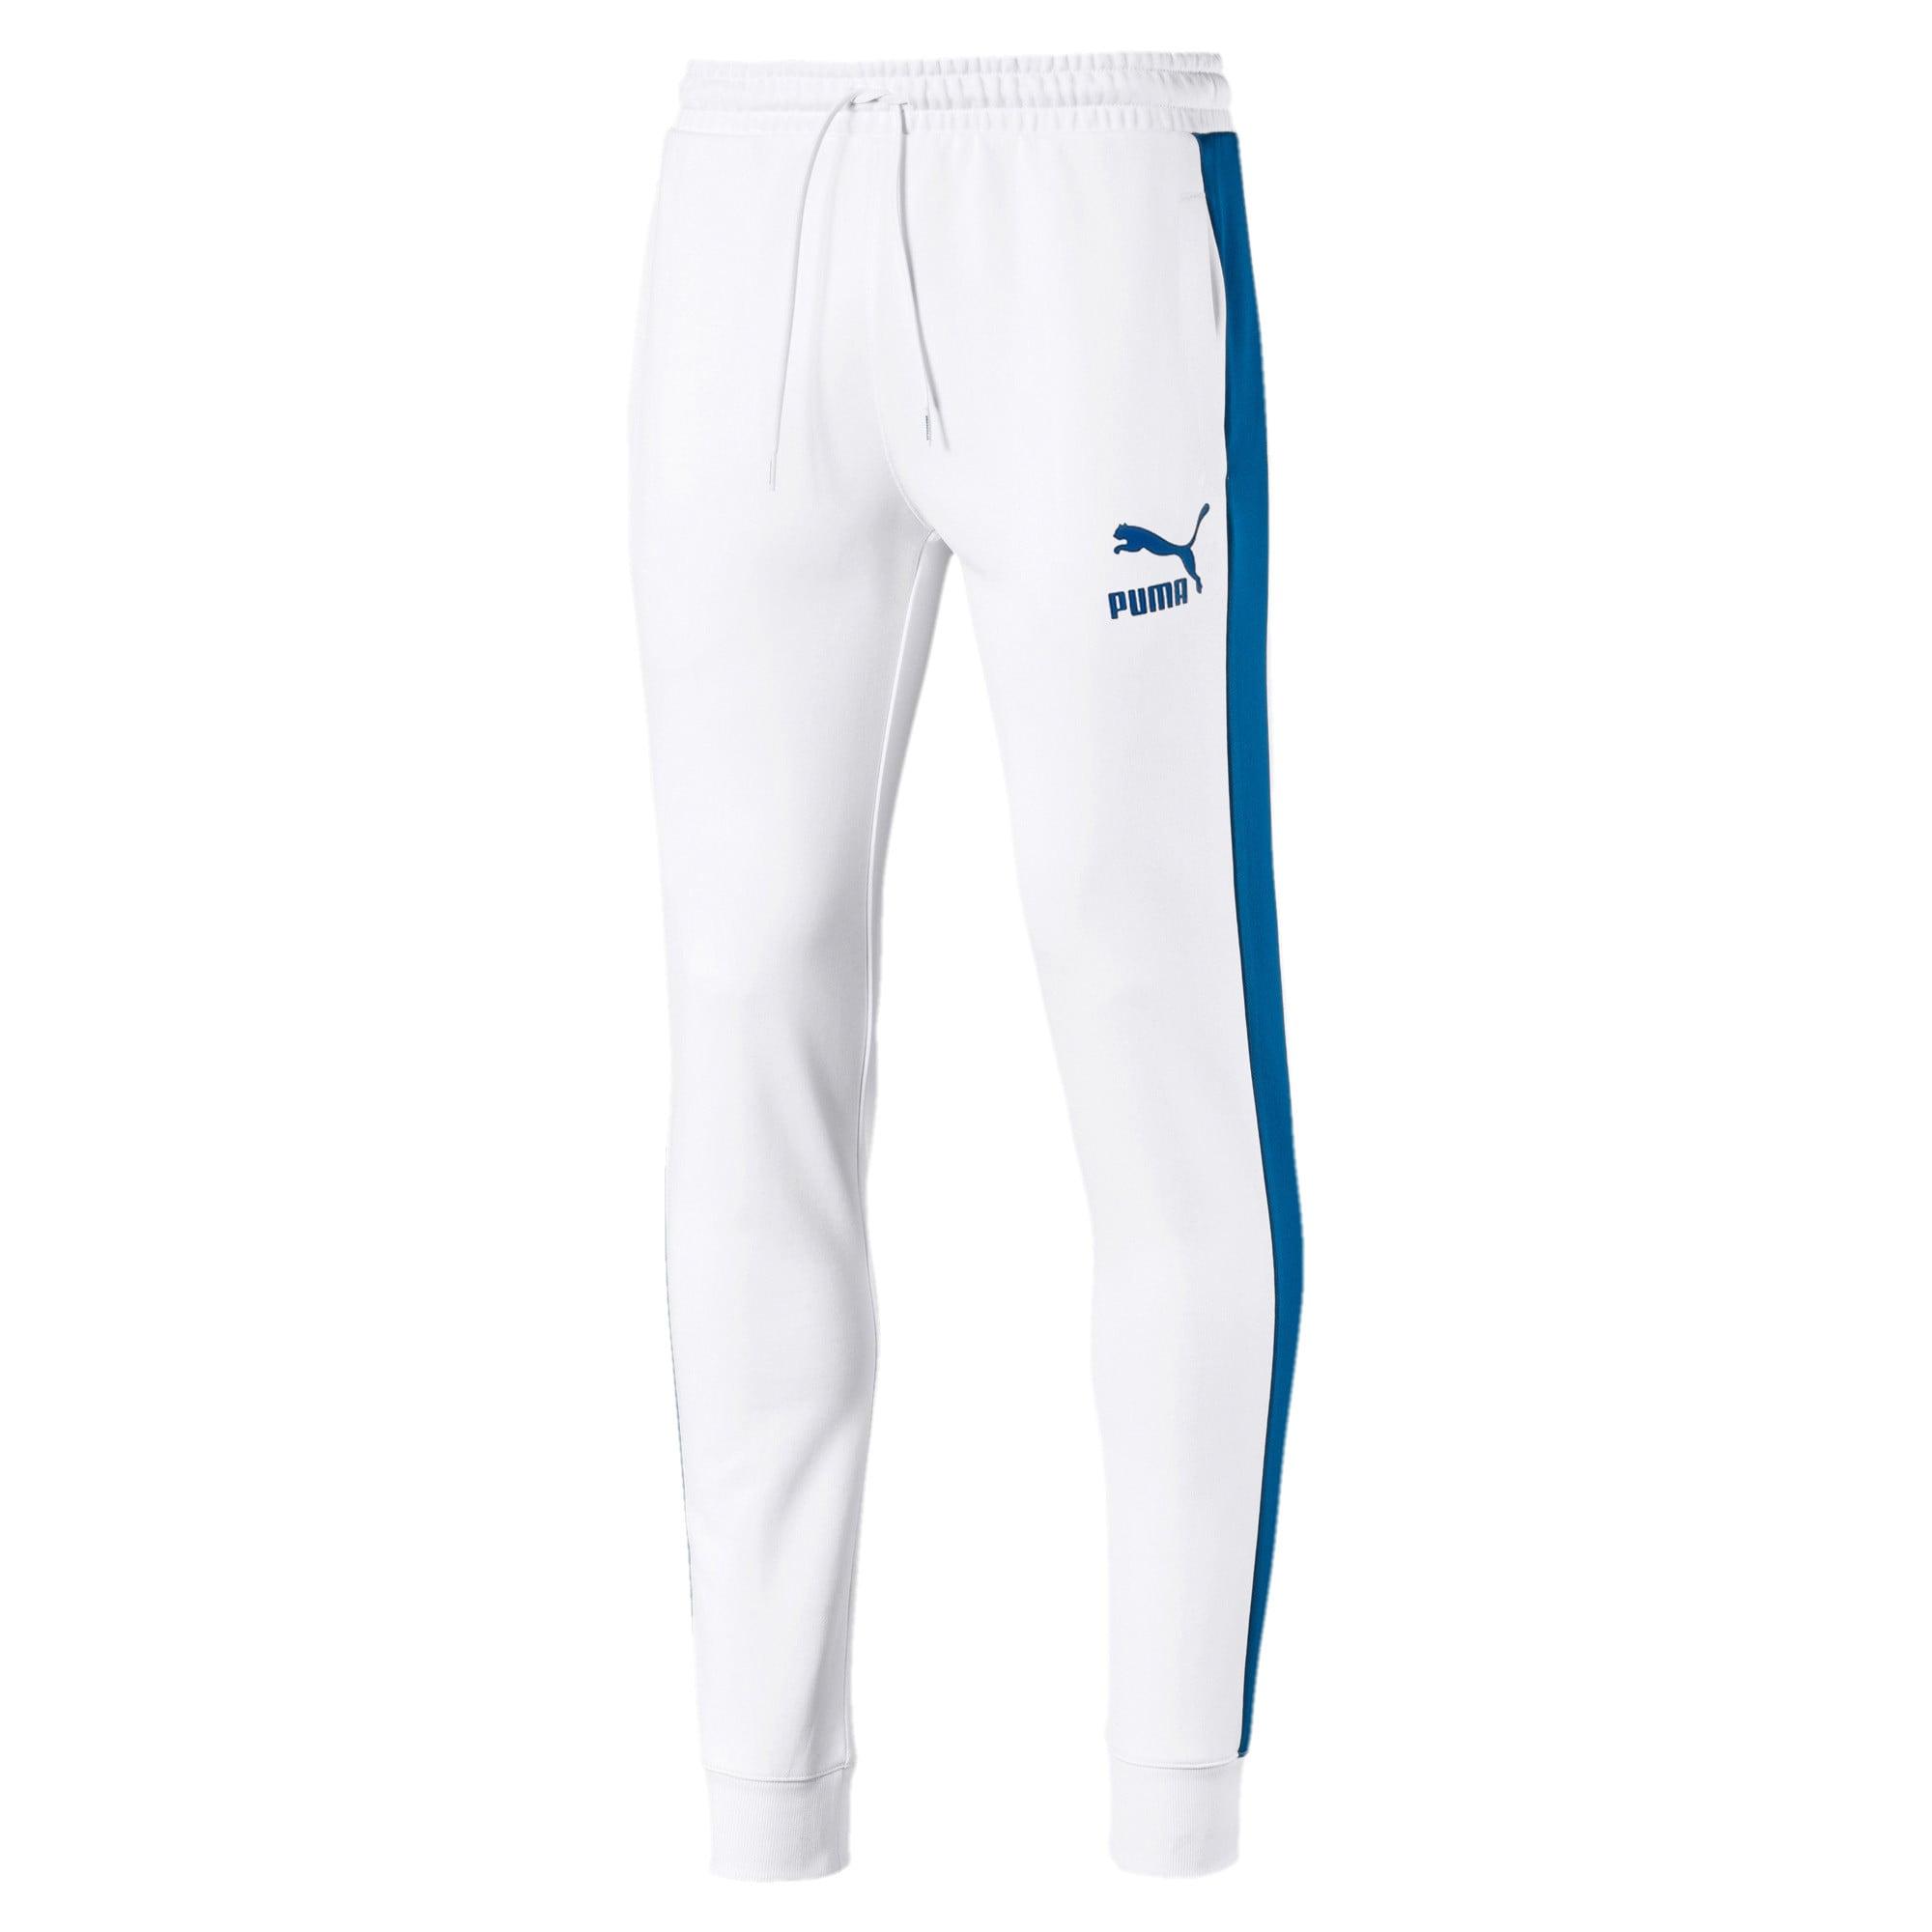 PUMA, Heren Broek 'Iconic T7', hemelsblauw / wit